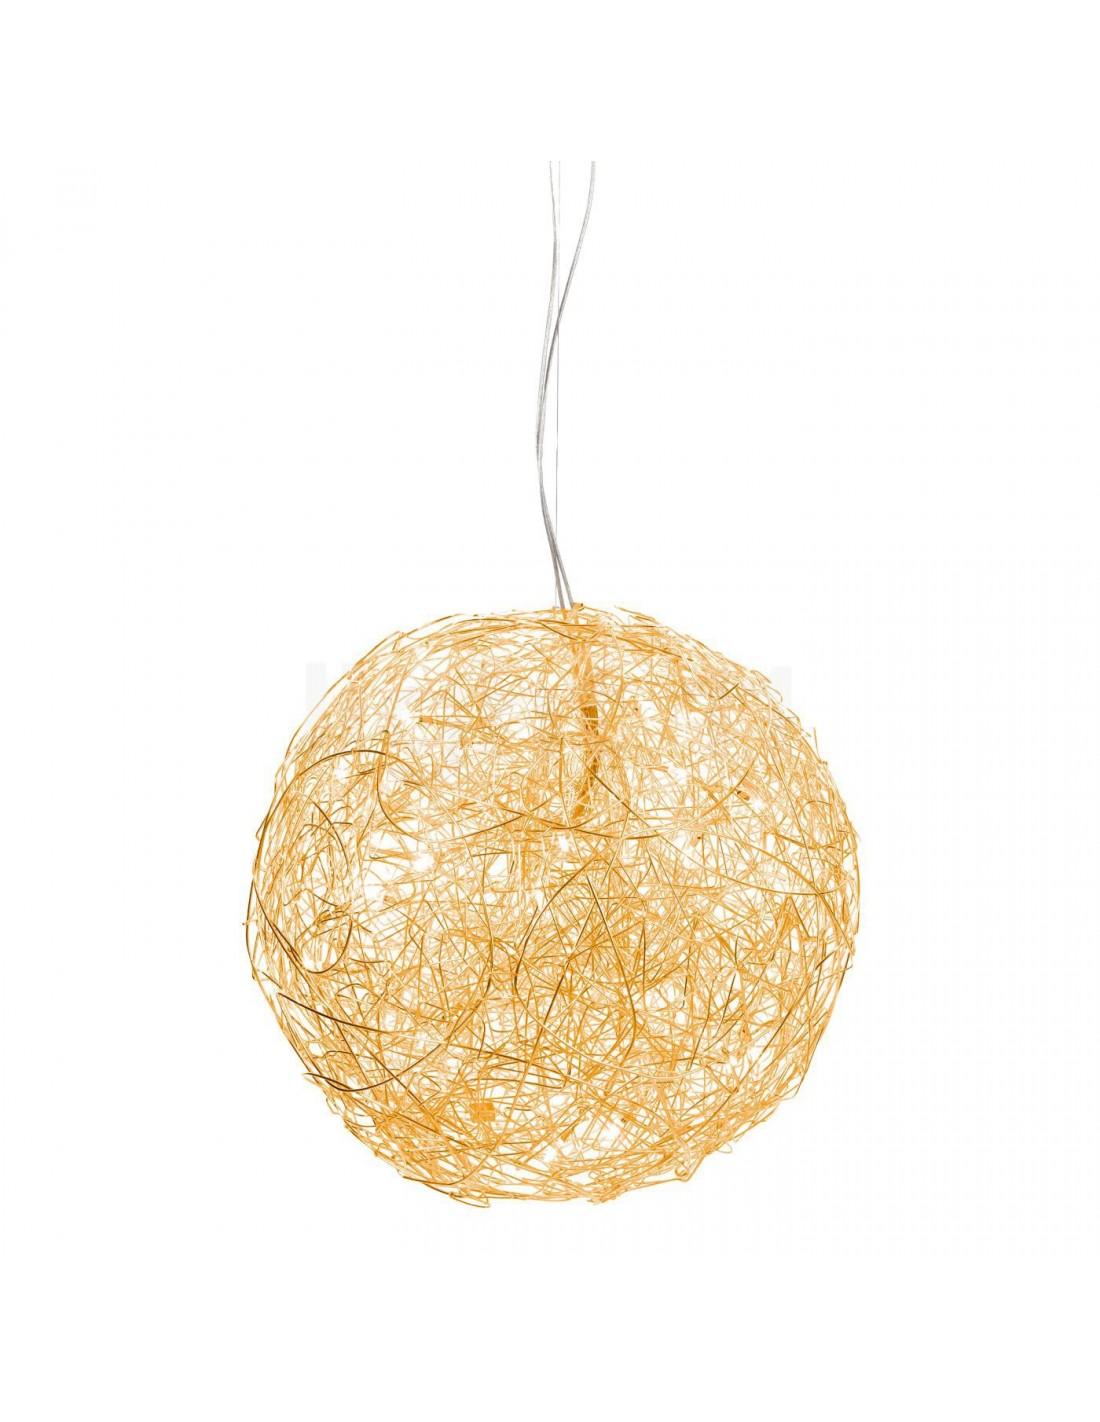 suspension fil de fer 50 cm anodis or marque italienne catellani smith. Black Bedroom Furniture Sets. Home Design Ideas